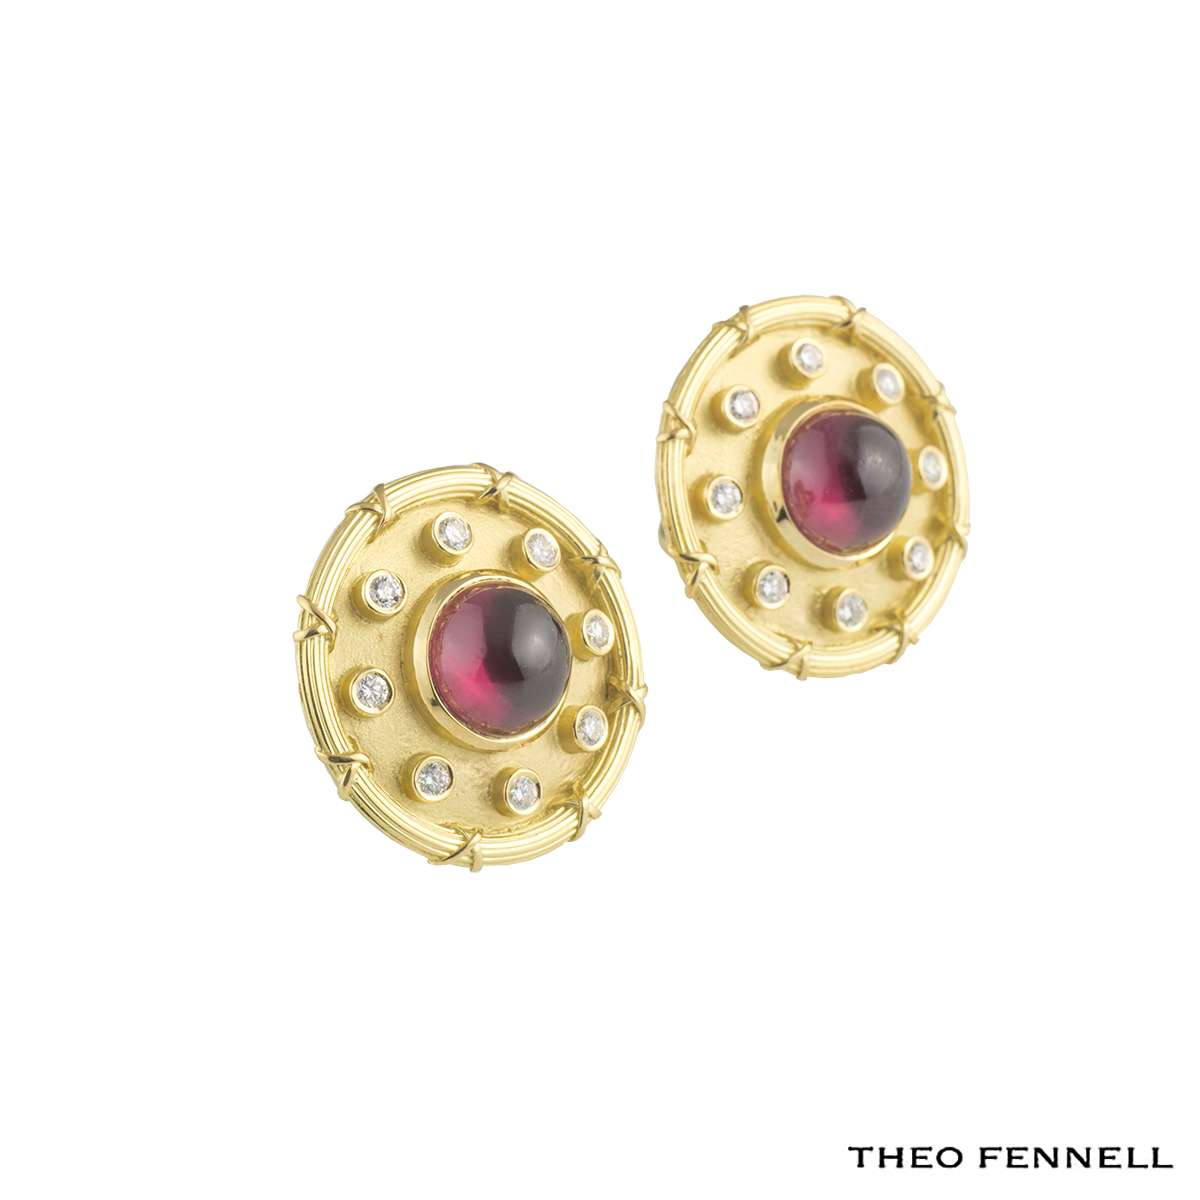 Theo Fennell Diamond Tourmaline Earrings 0.48ct G/VS